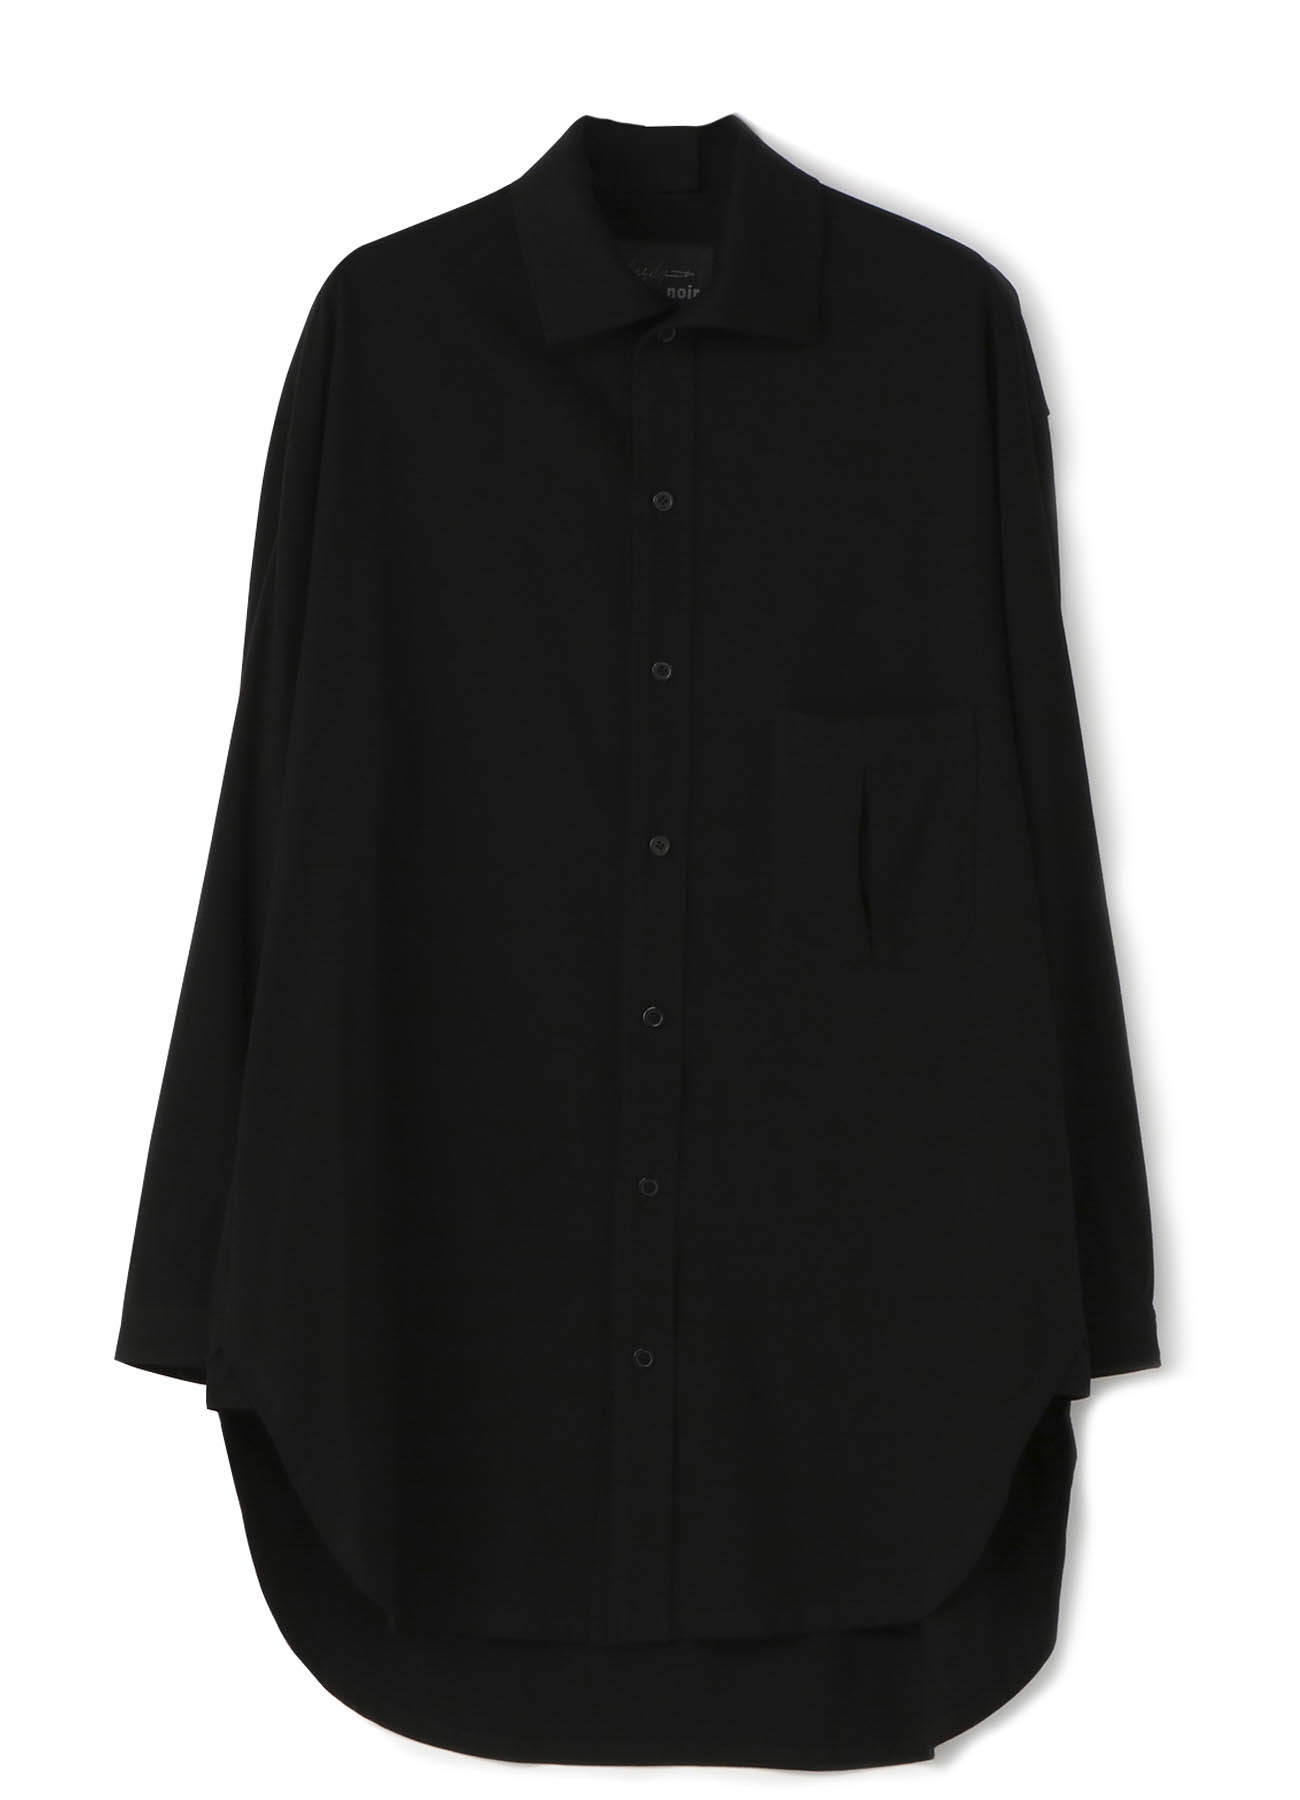 RY/スパンローン 衿後アキシャツ